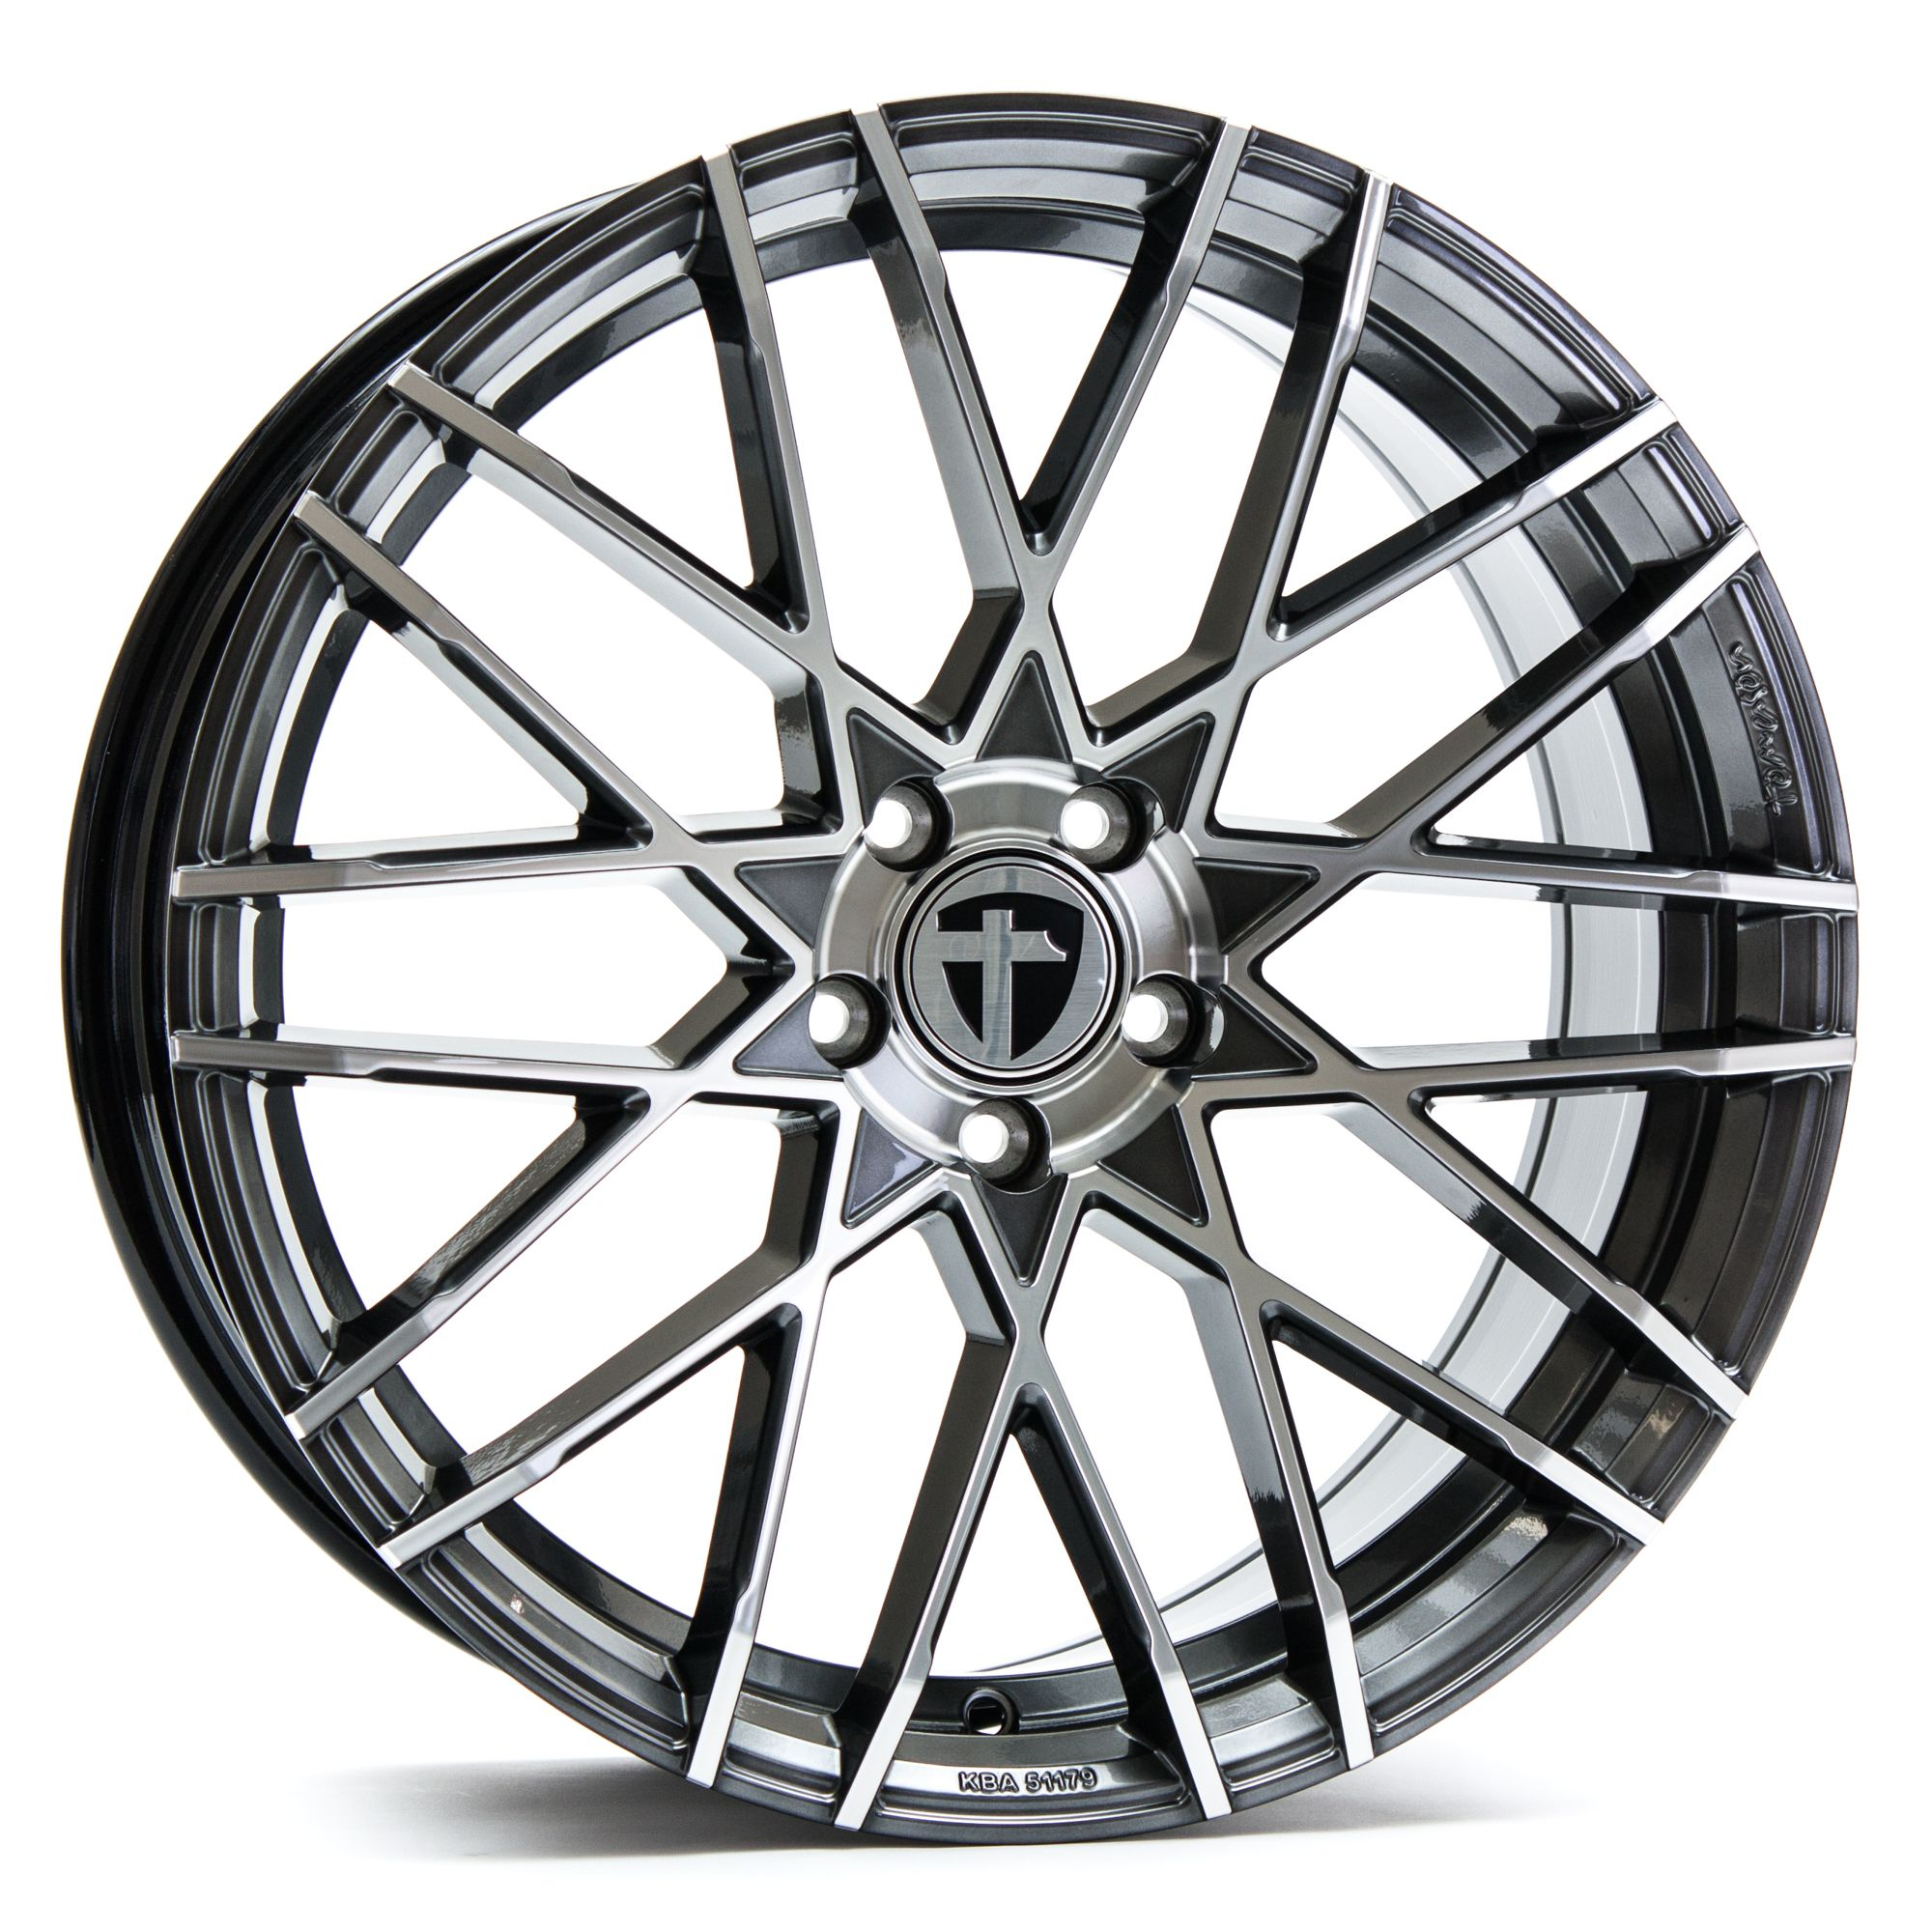 tomason-tn19-felge-silber-schwarz-alufelge-2000×2000